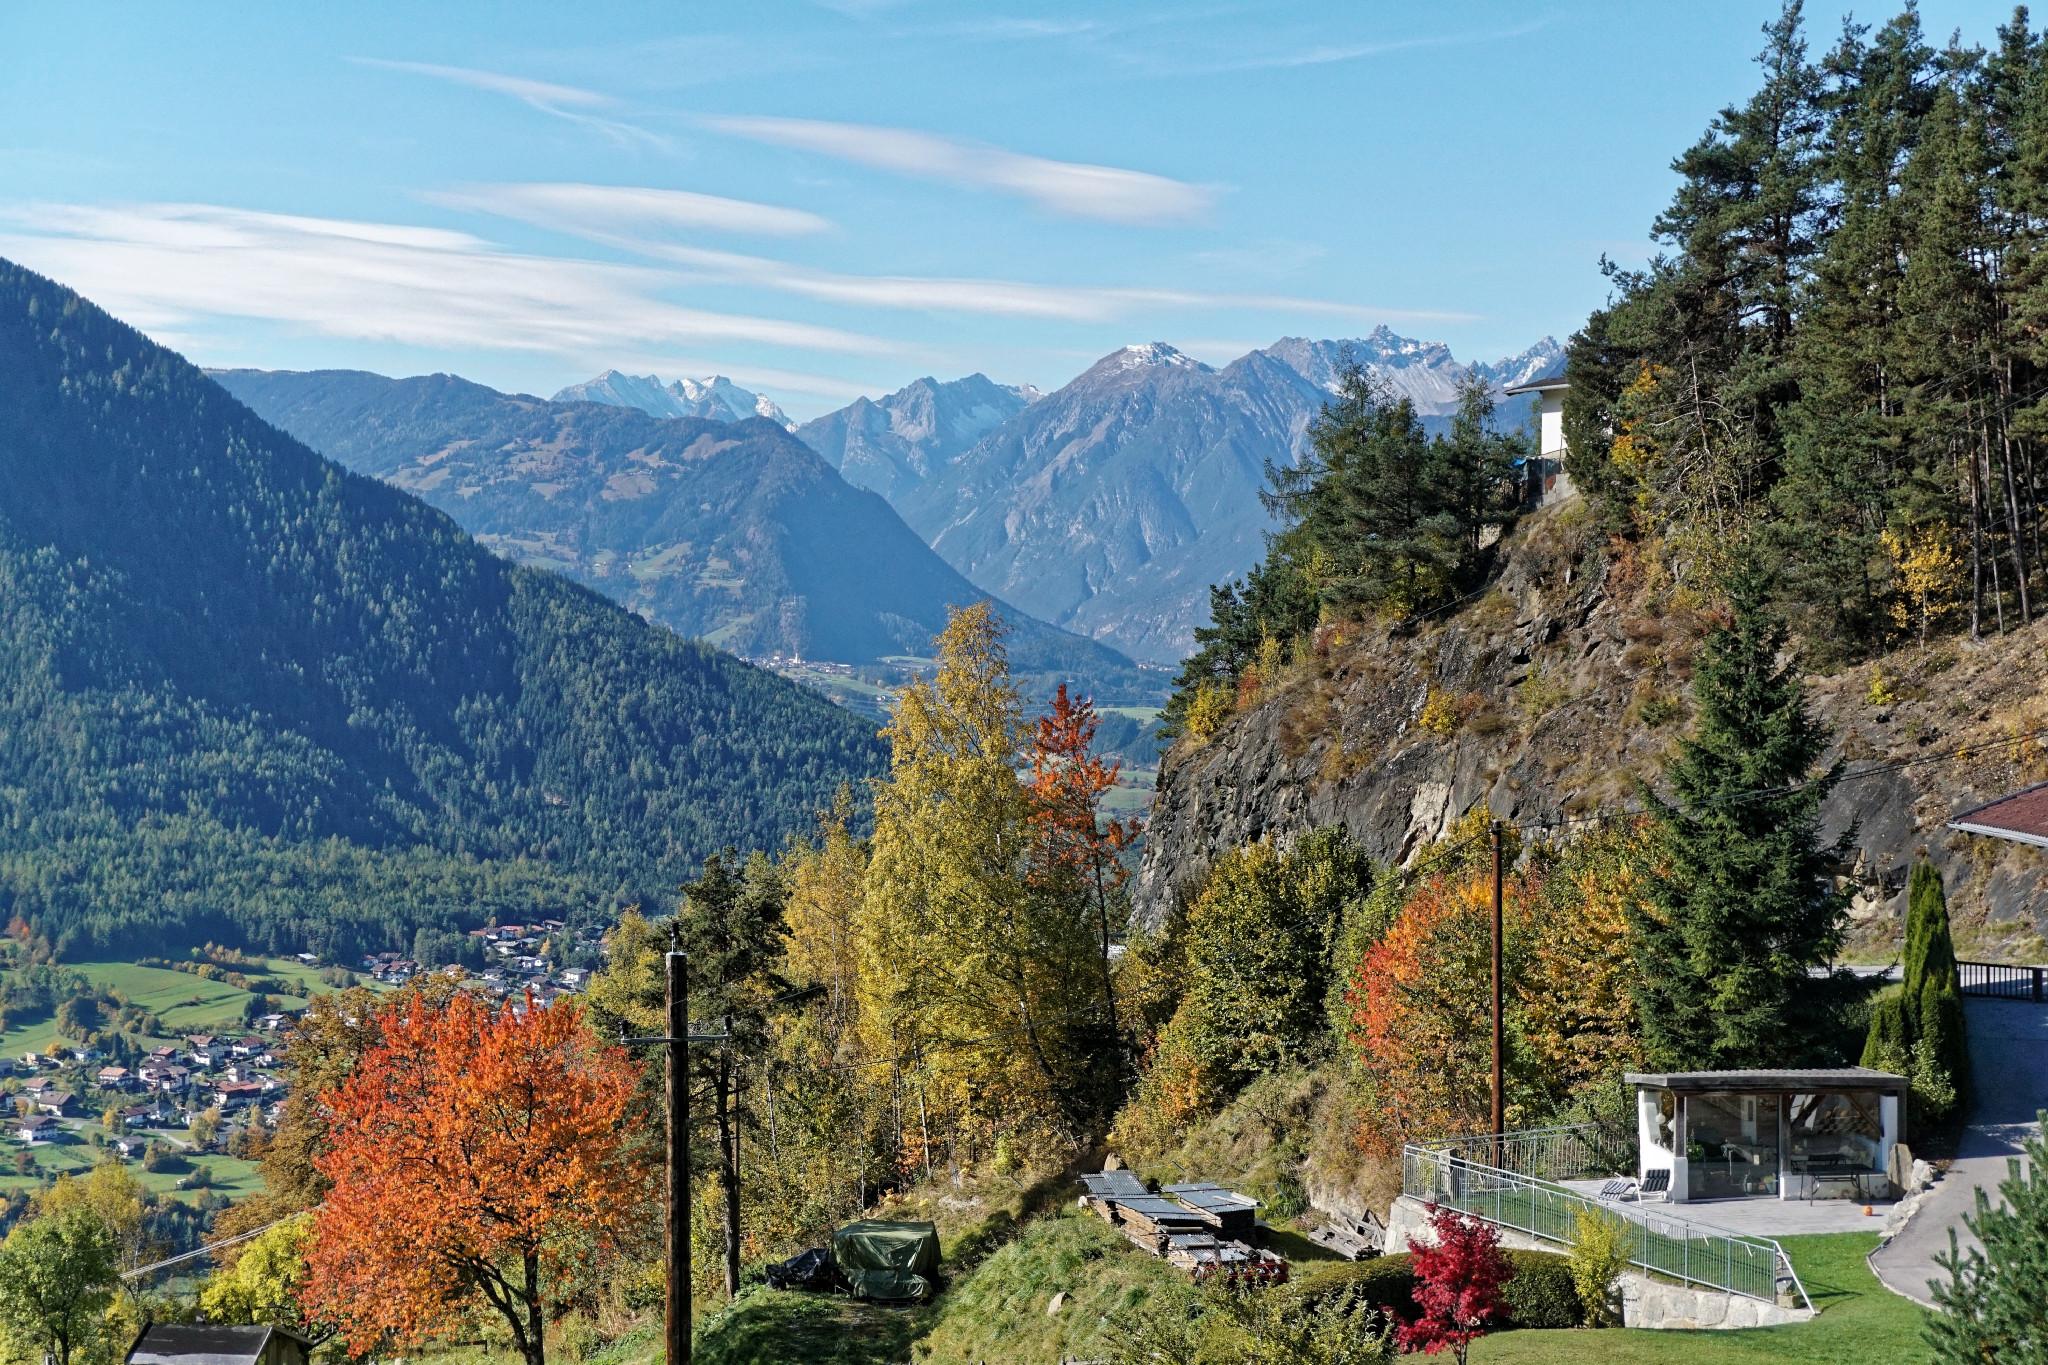 Herbst in den Alpen